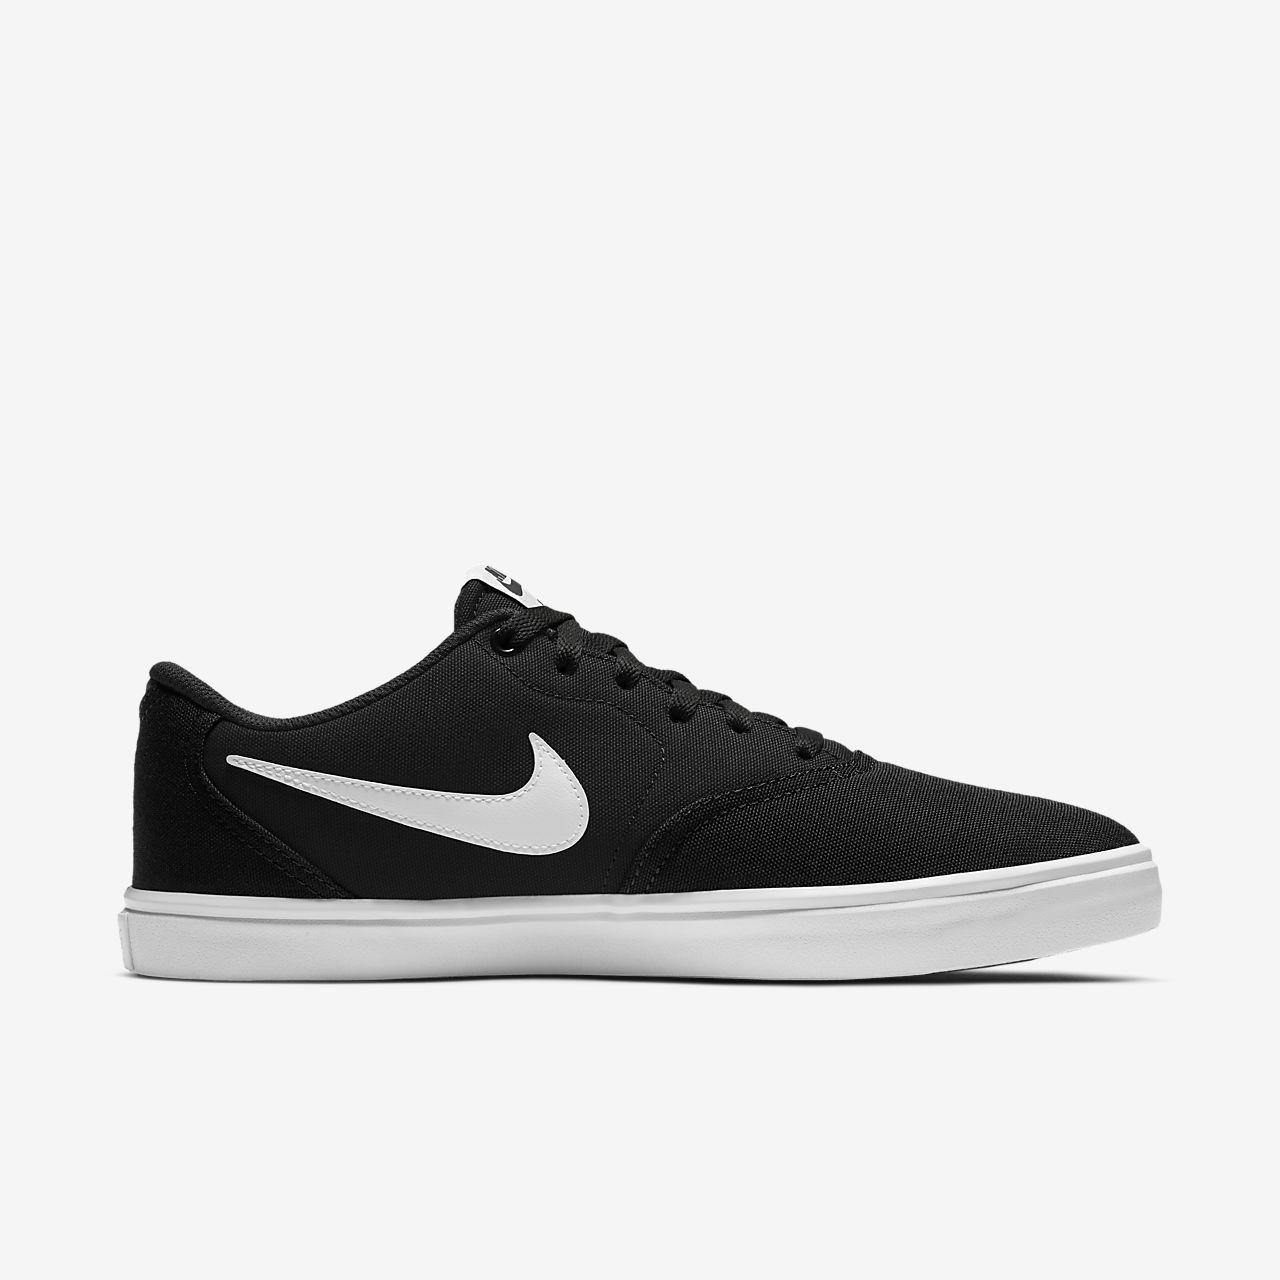 Nike SB Check Solarsoft Canvas Herren Skateboardschuh